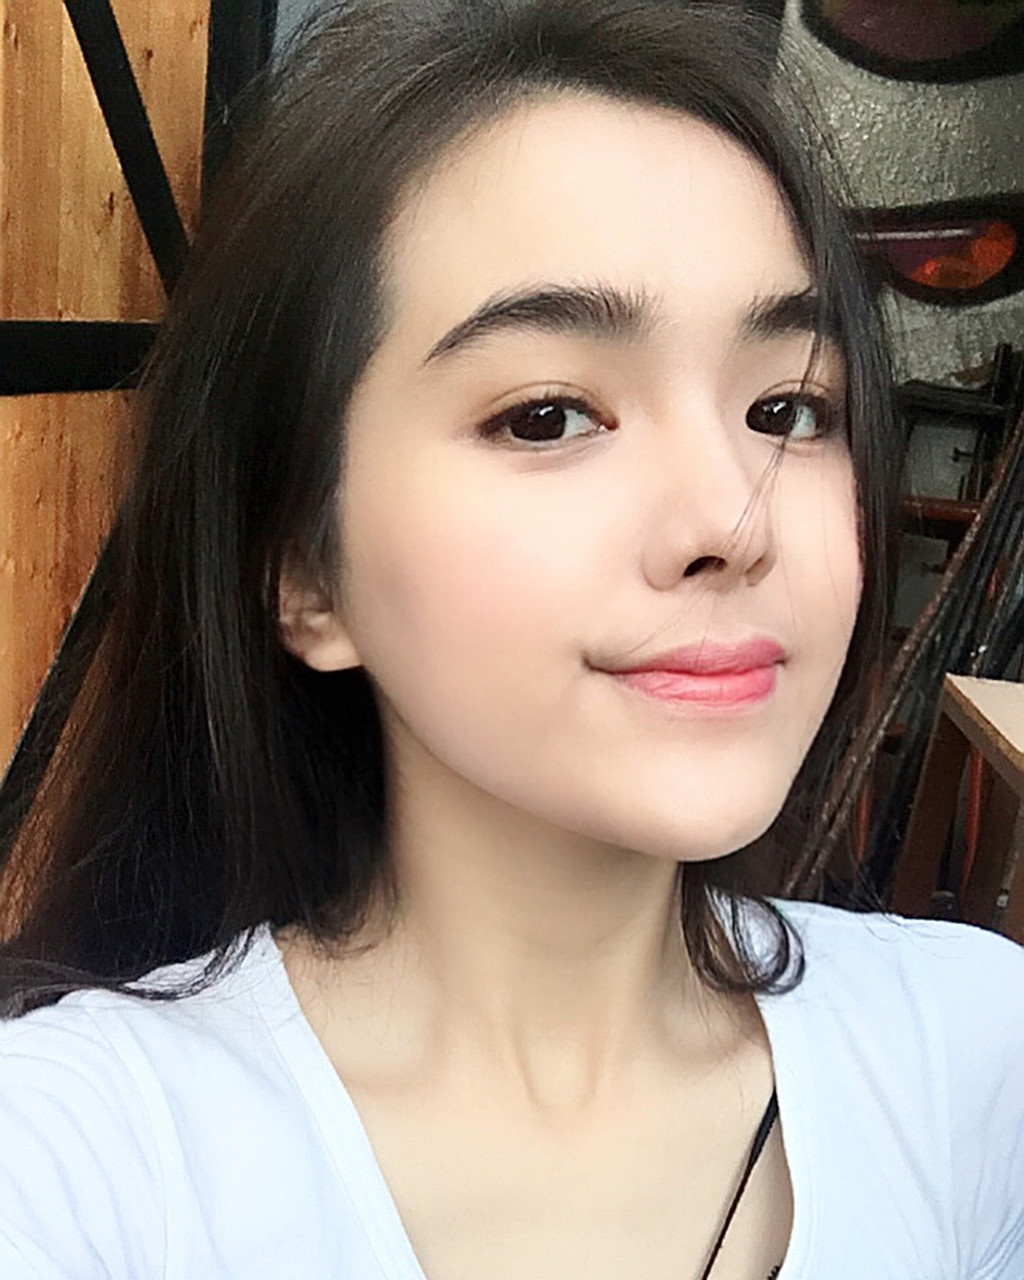 Nhan sac cua nu sinh Tran Phu mang 3 dong mau Thai - Viet - Trung hinh anh 5